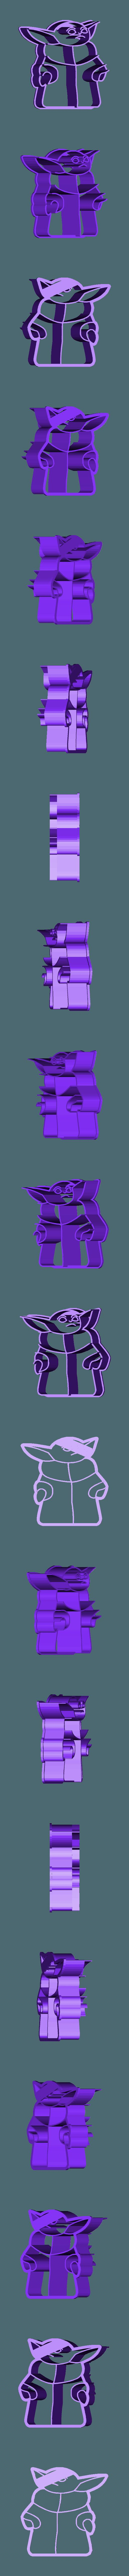 cookie-3Demon__Yoda-meme-Mandalorian-Inside.stl Download STL file Yoda Baby Cookie Cutter Mandalorian • 3D printer design, 3D-mon